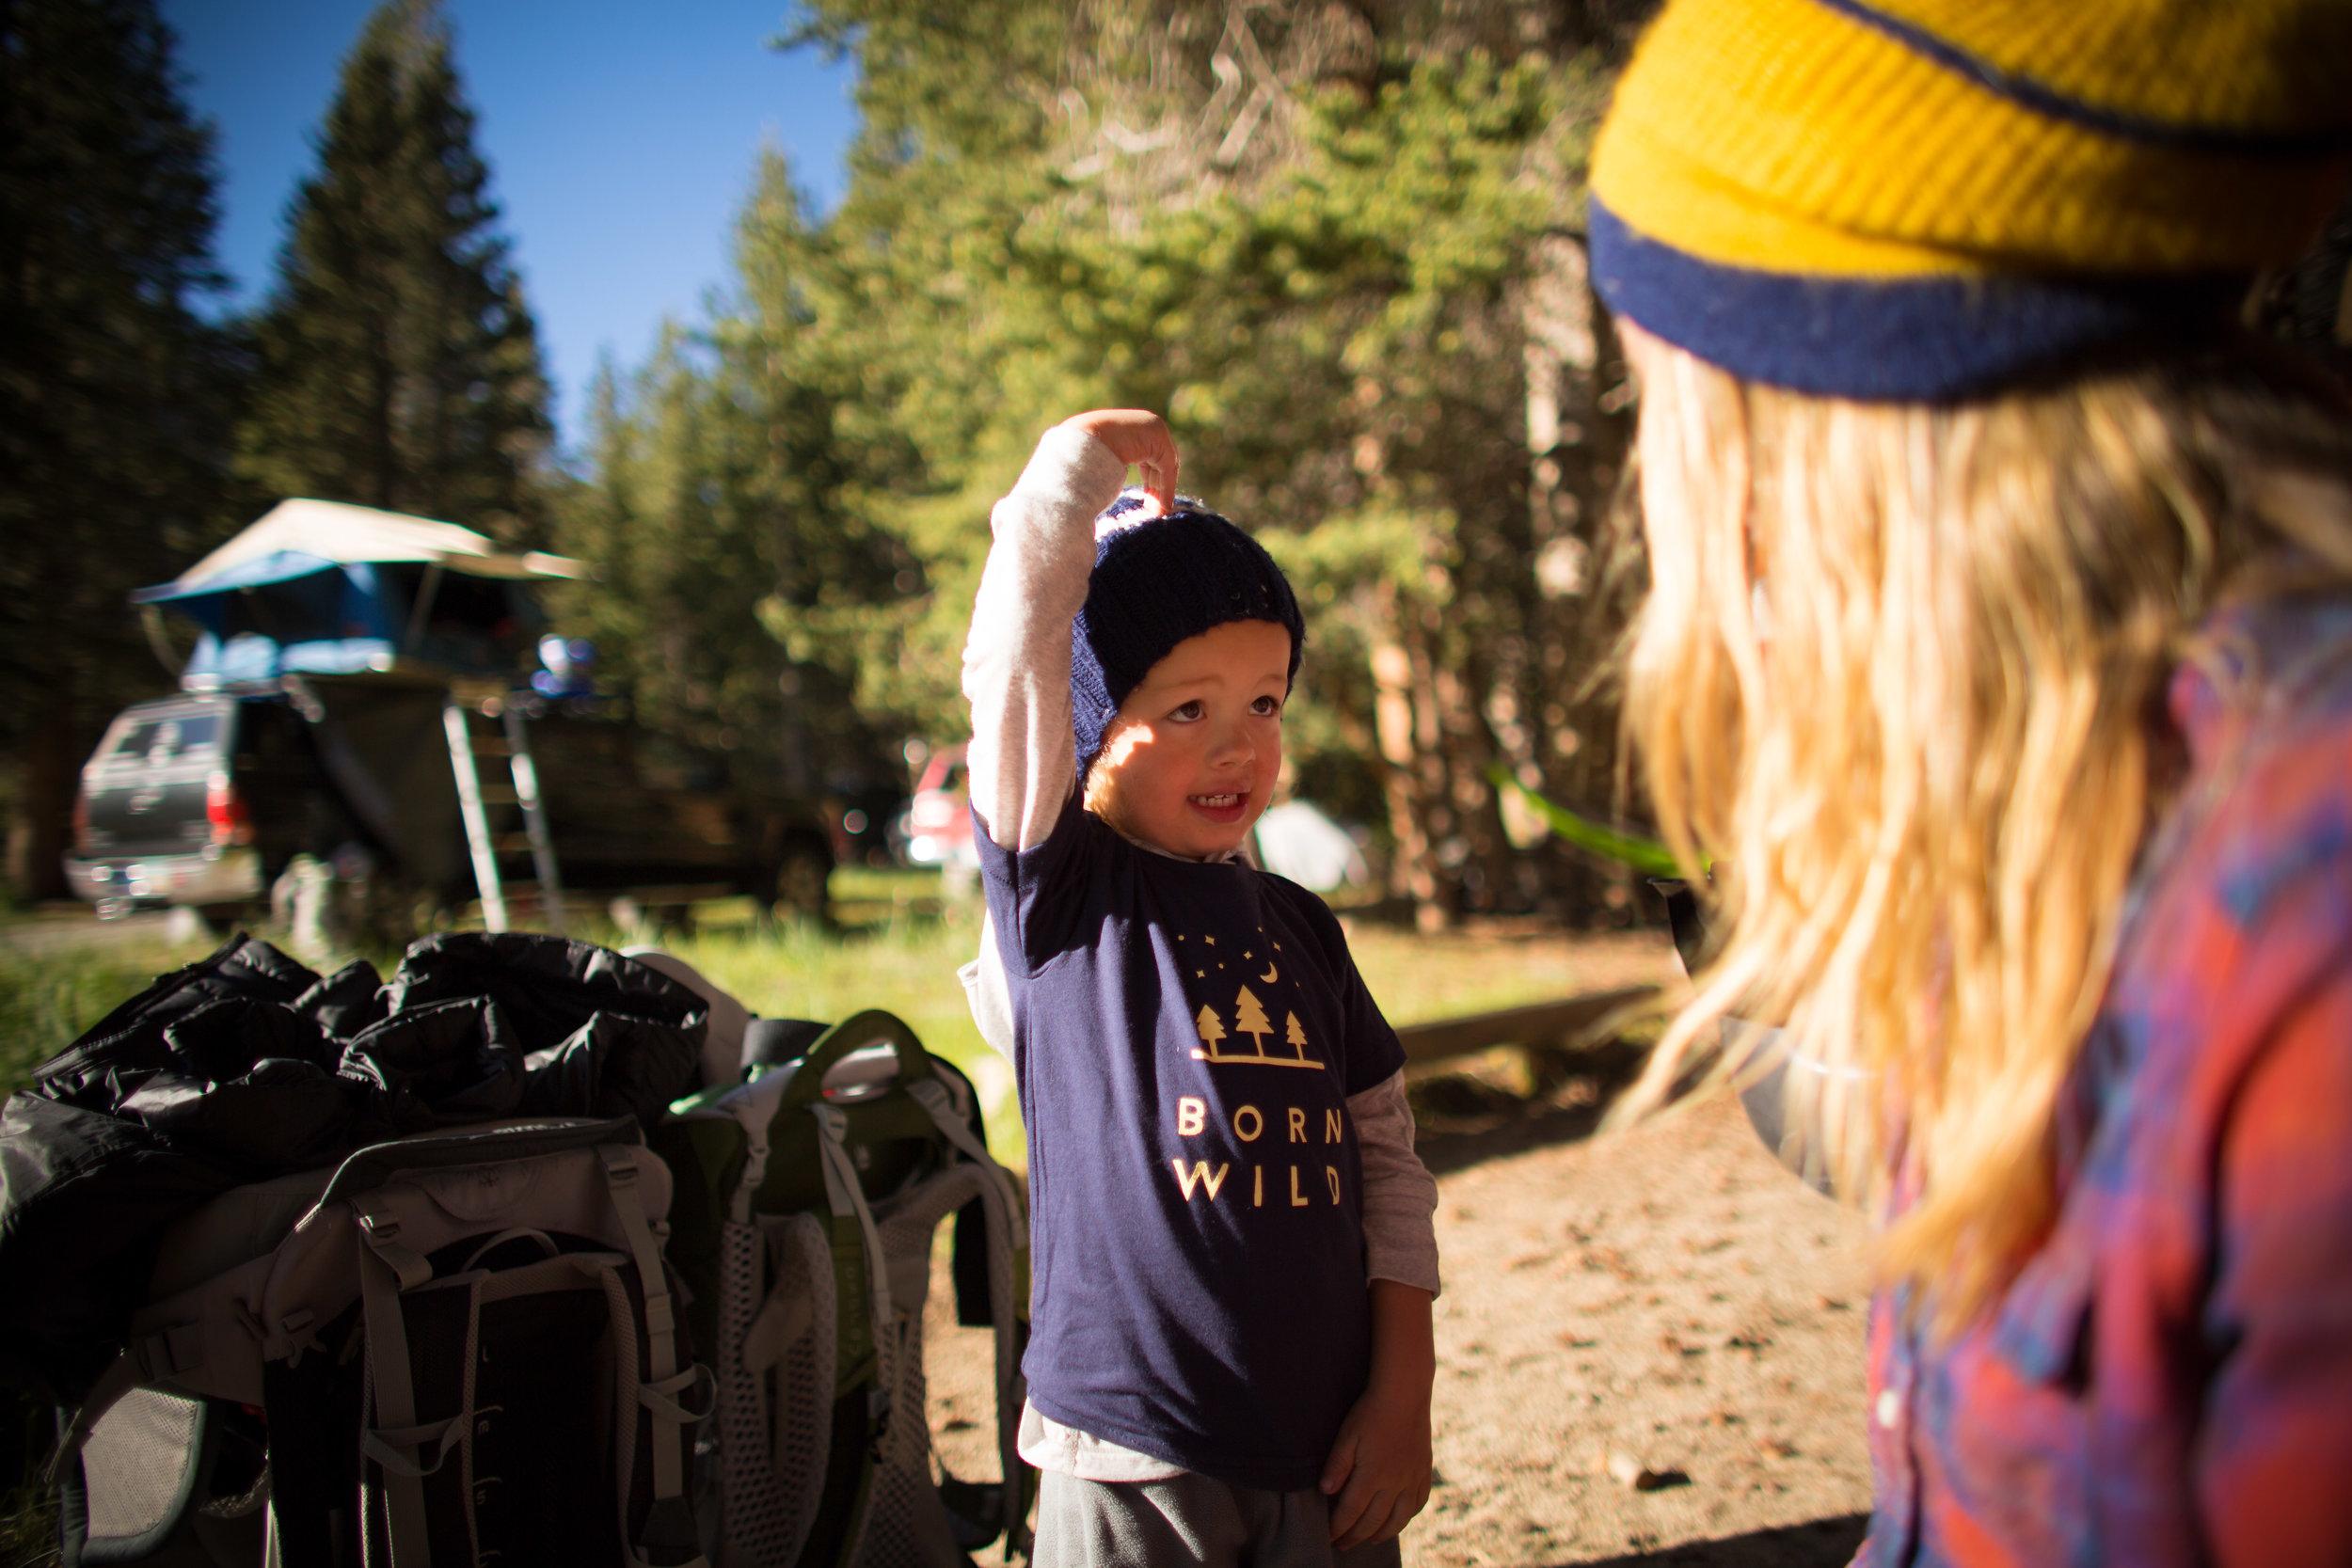 Wild_Child_Photographer_AlyNicklas-120.jpg